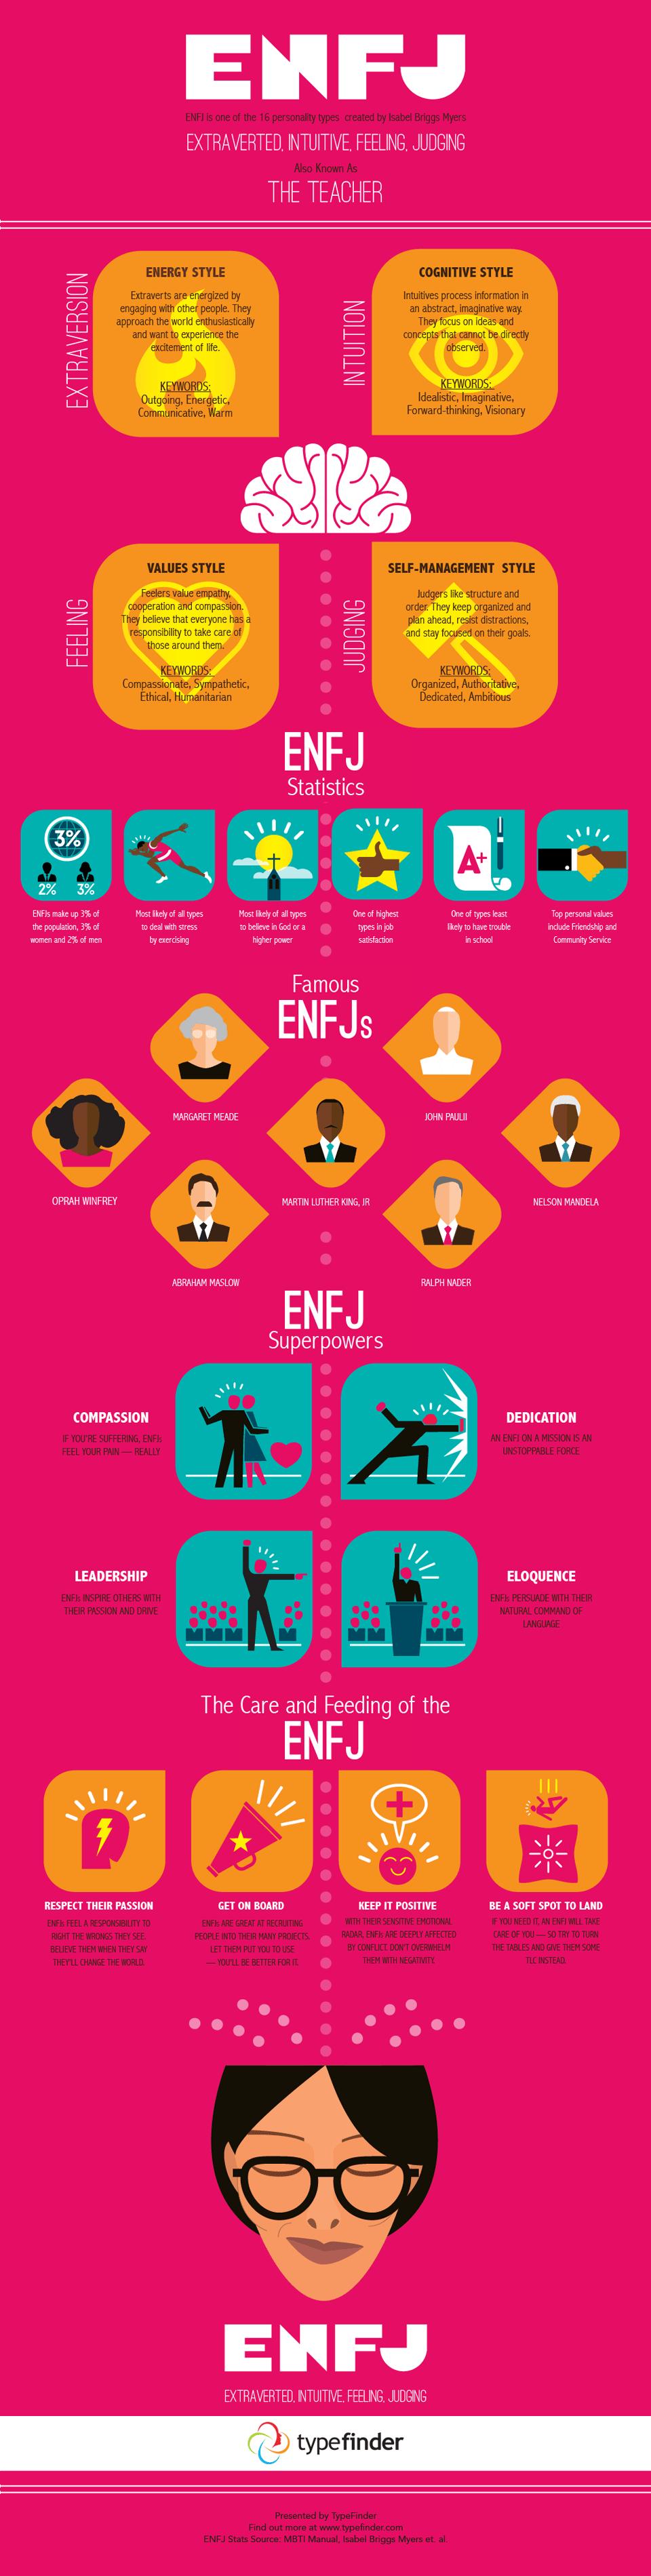 ENFJ Infographic